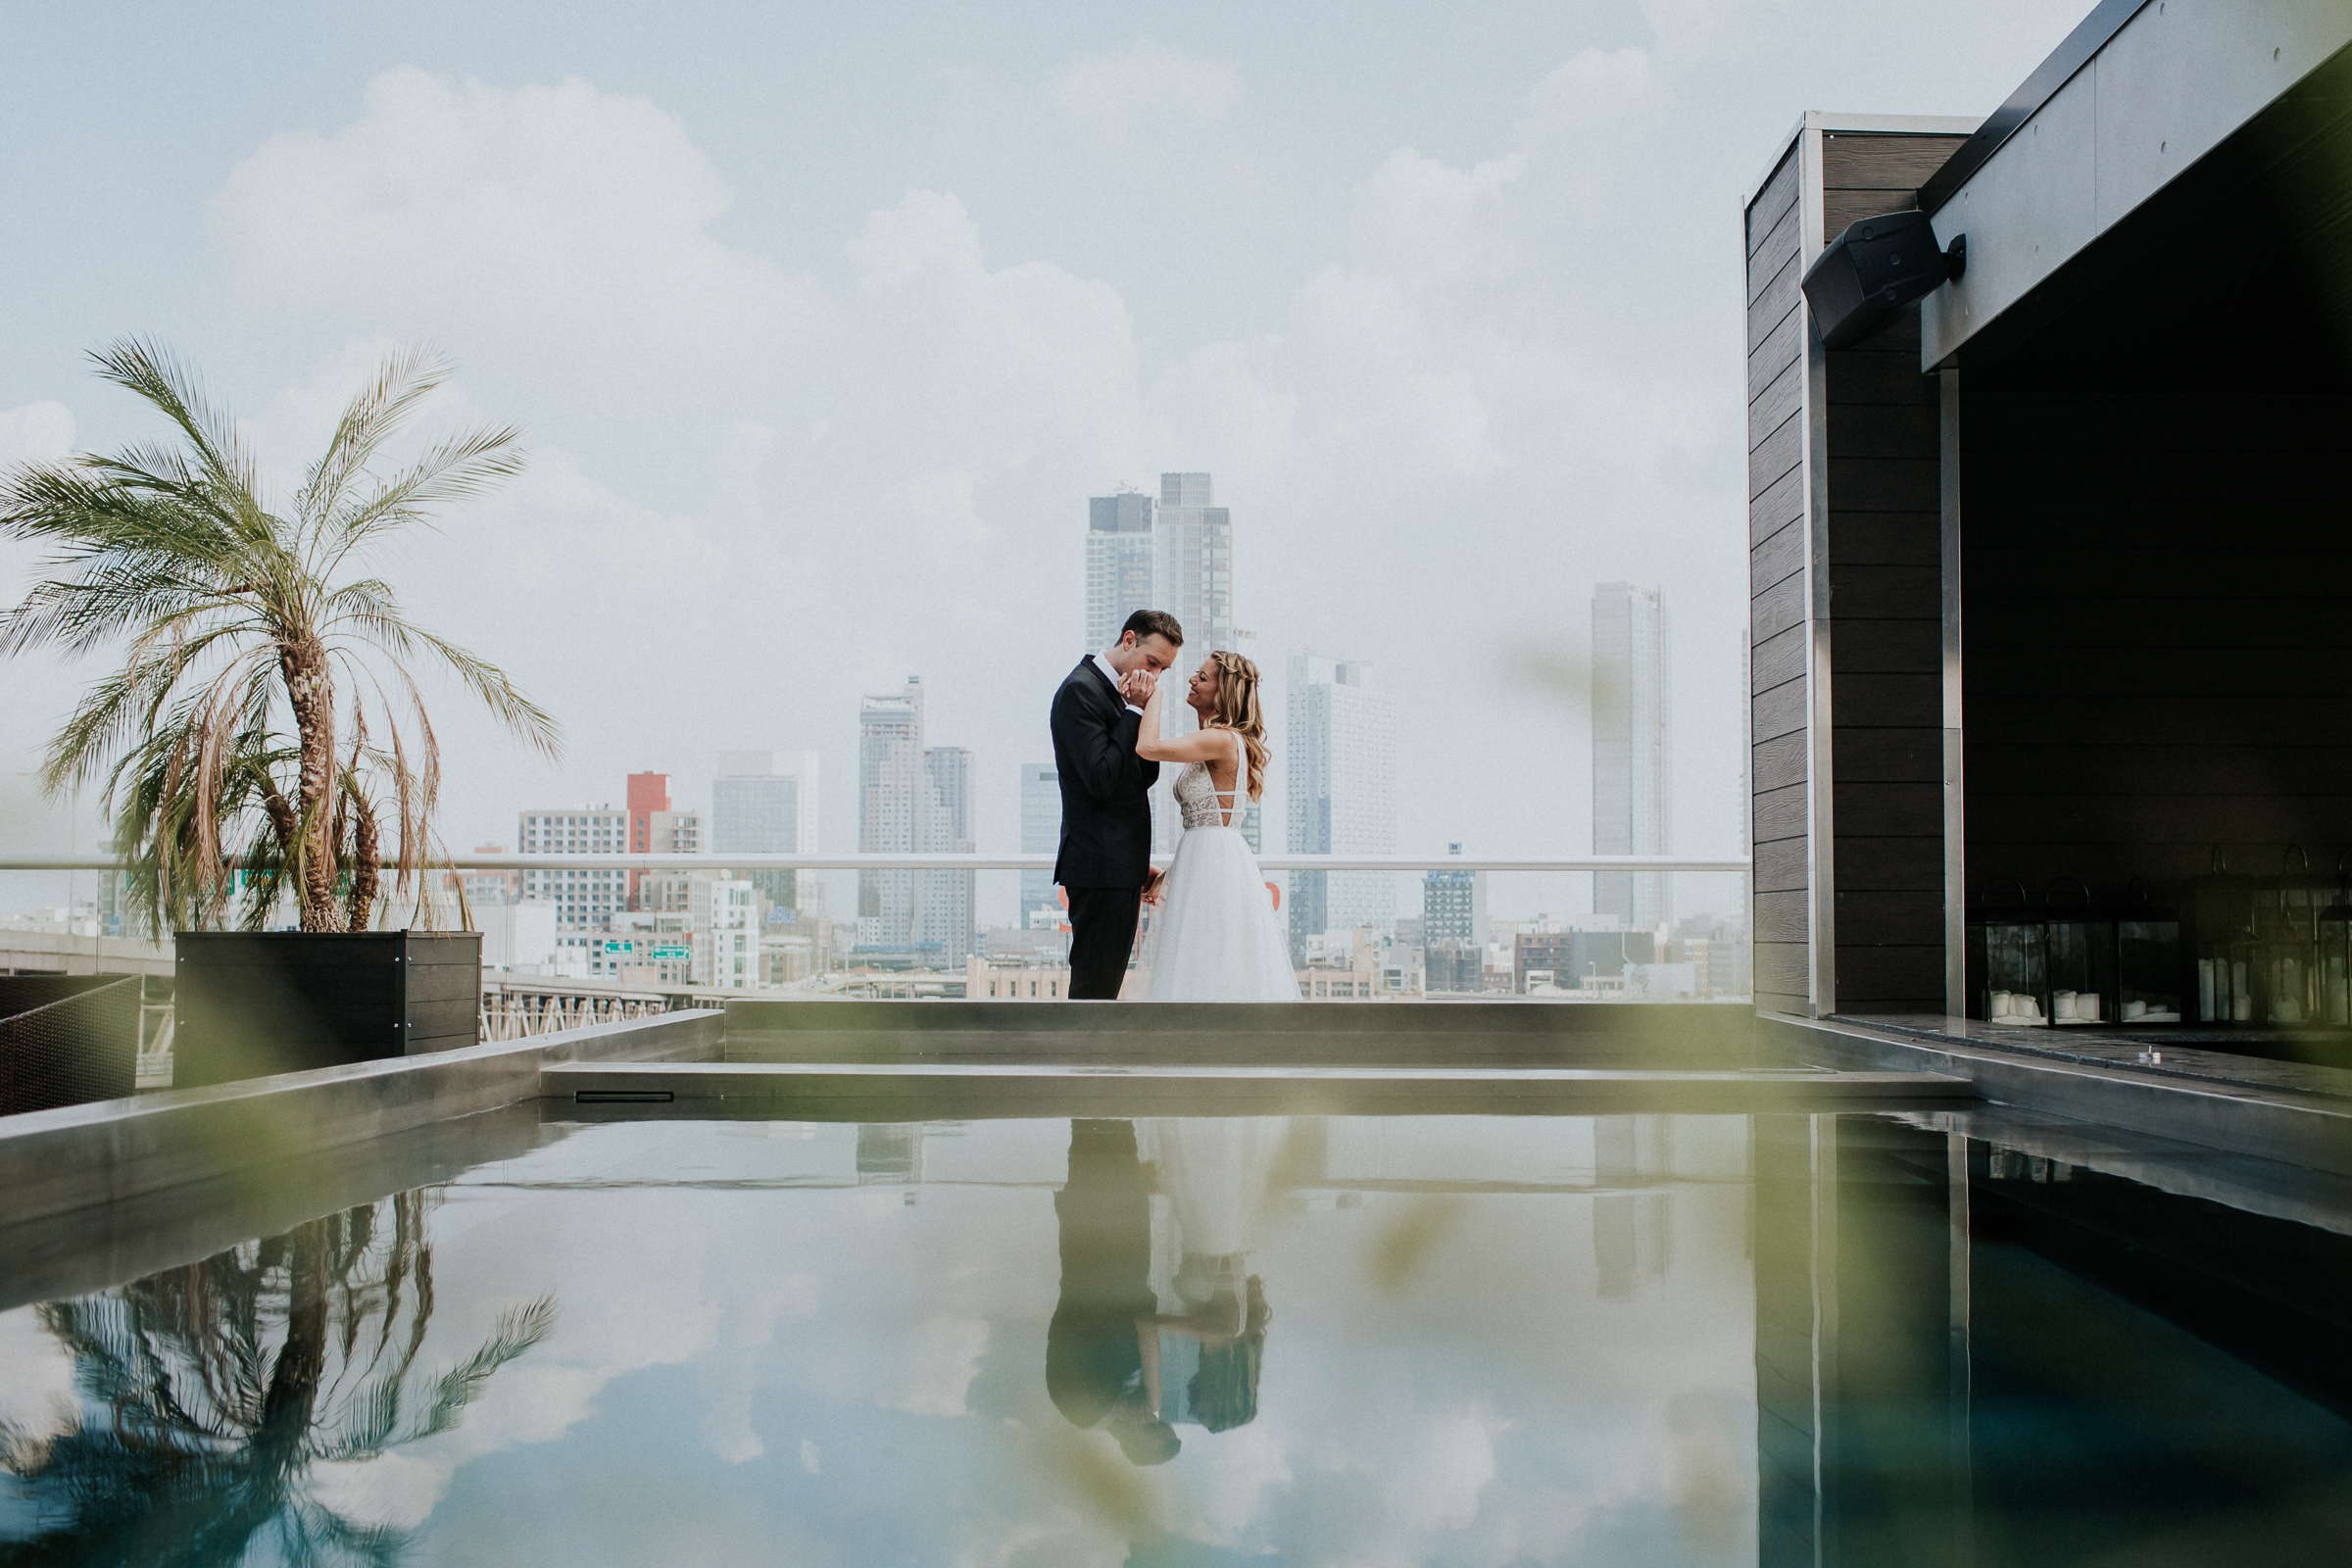 Ravel-Hotel-Penthouse-808-Long-Island-City-New-York-Documentary-Wedding-Photographer-23.jpg